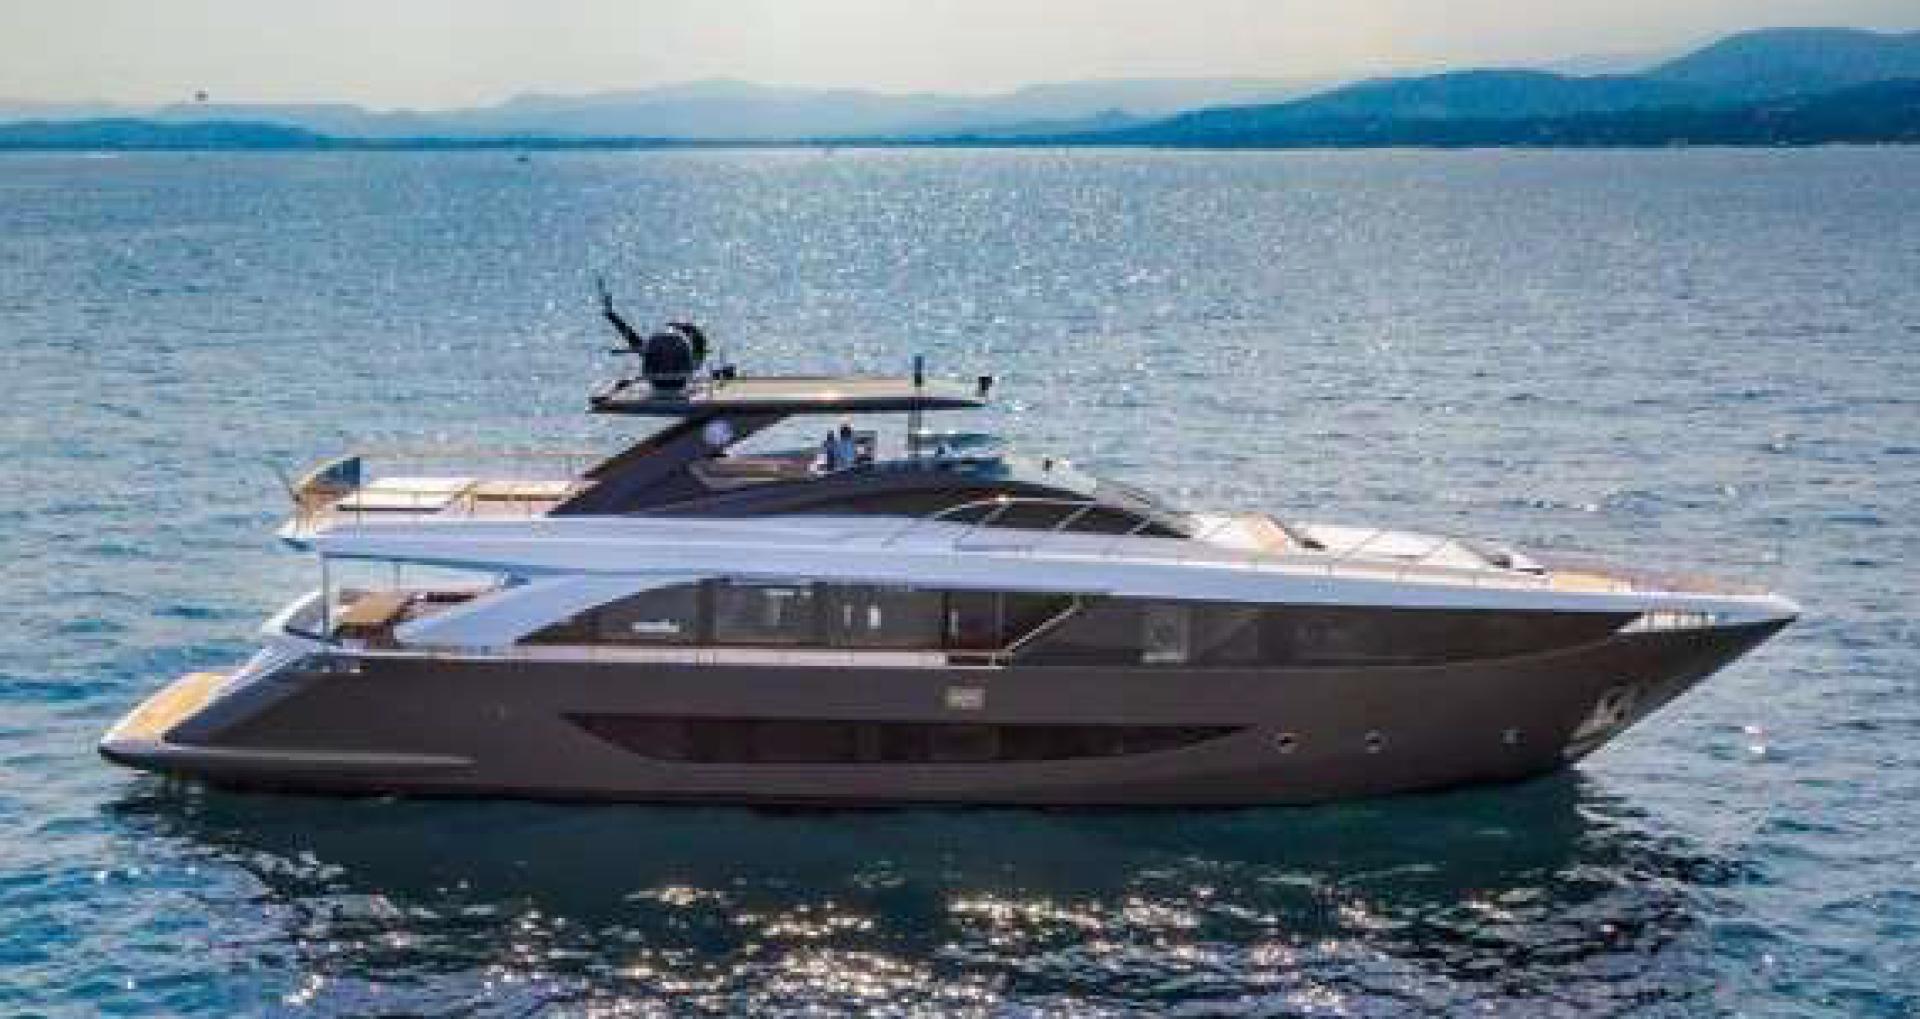 2019 PerMare 100' Motor Yacht